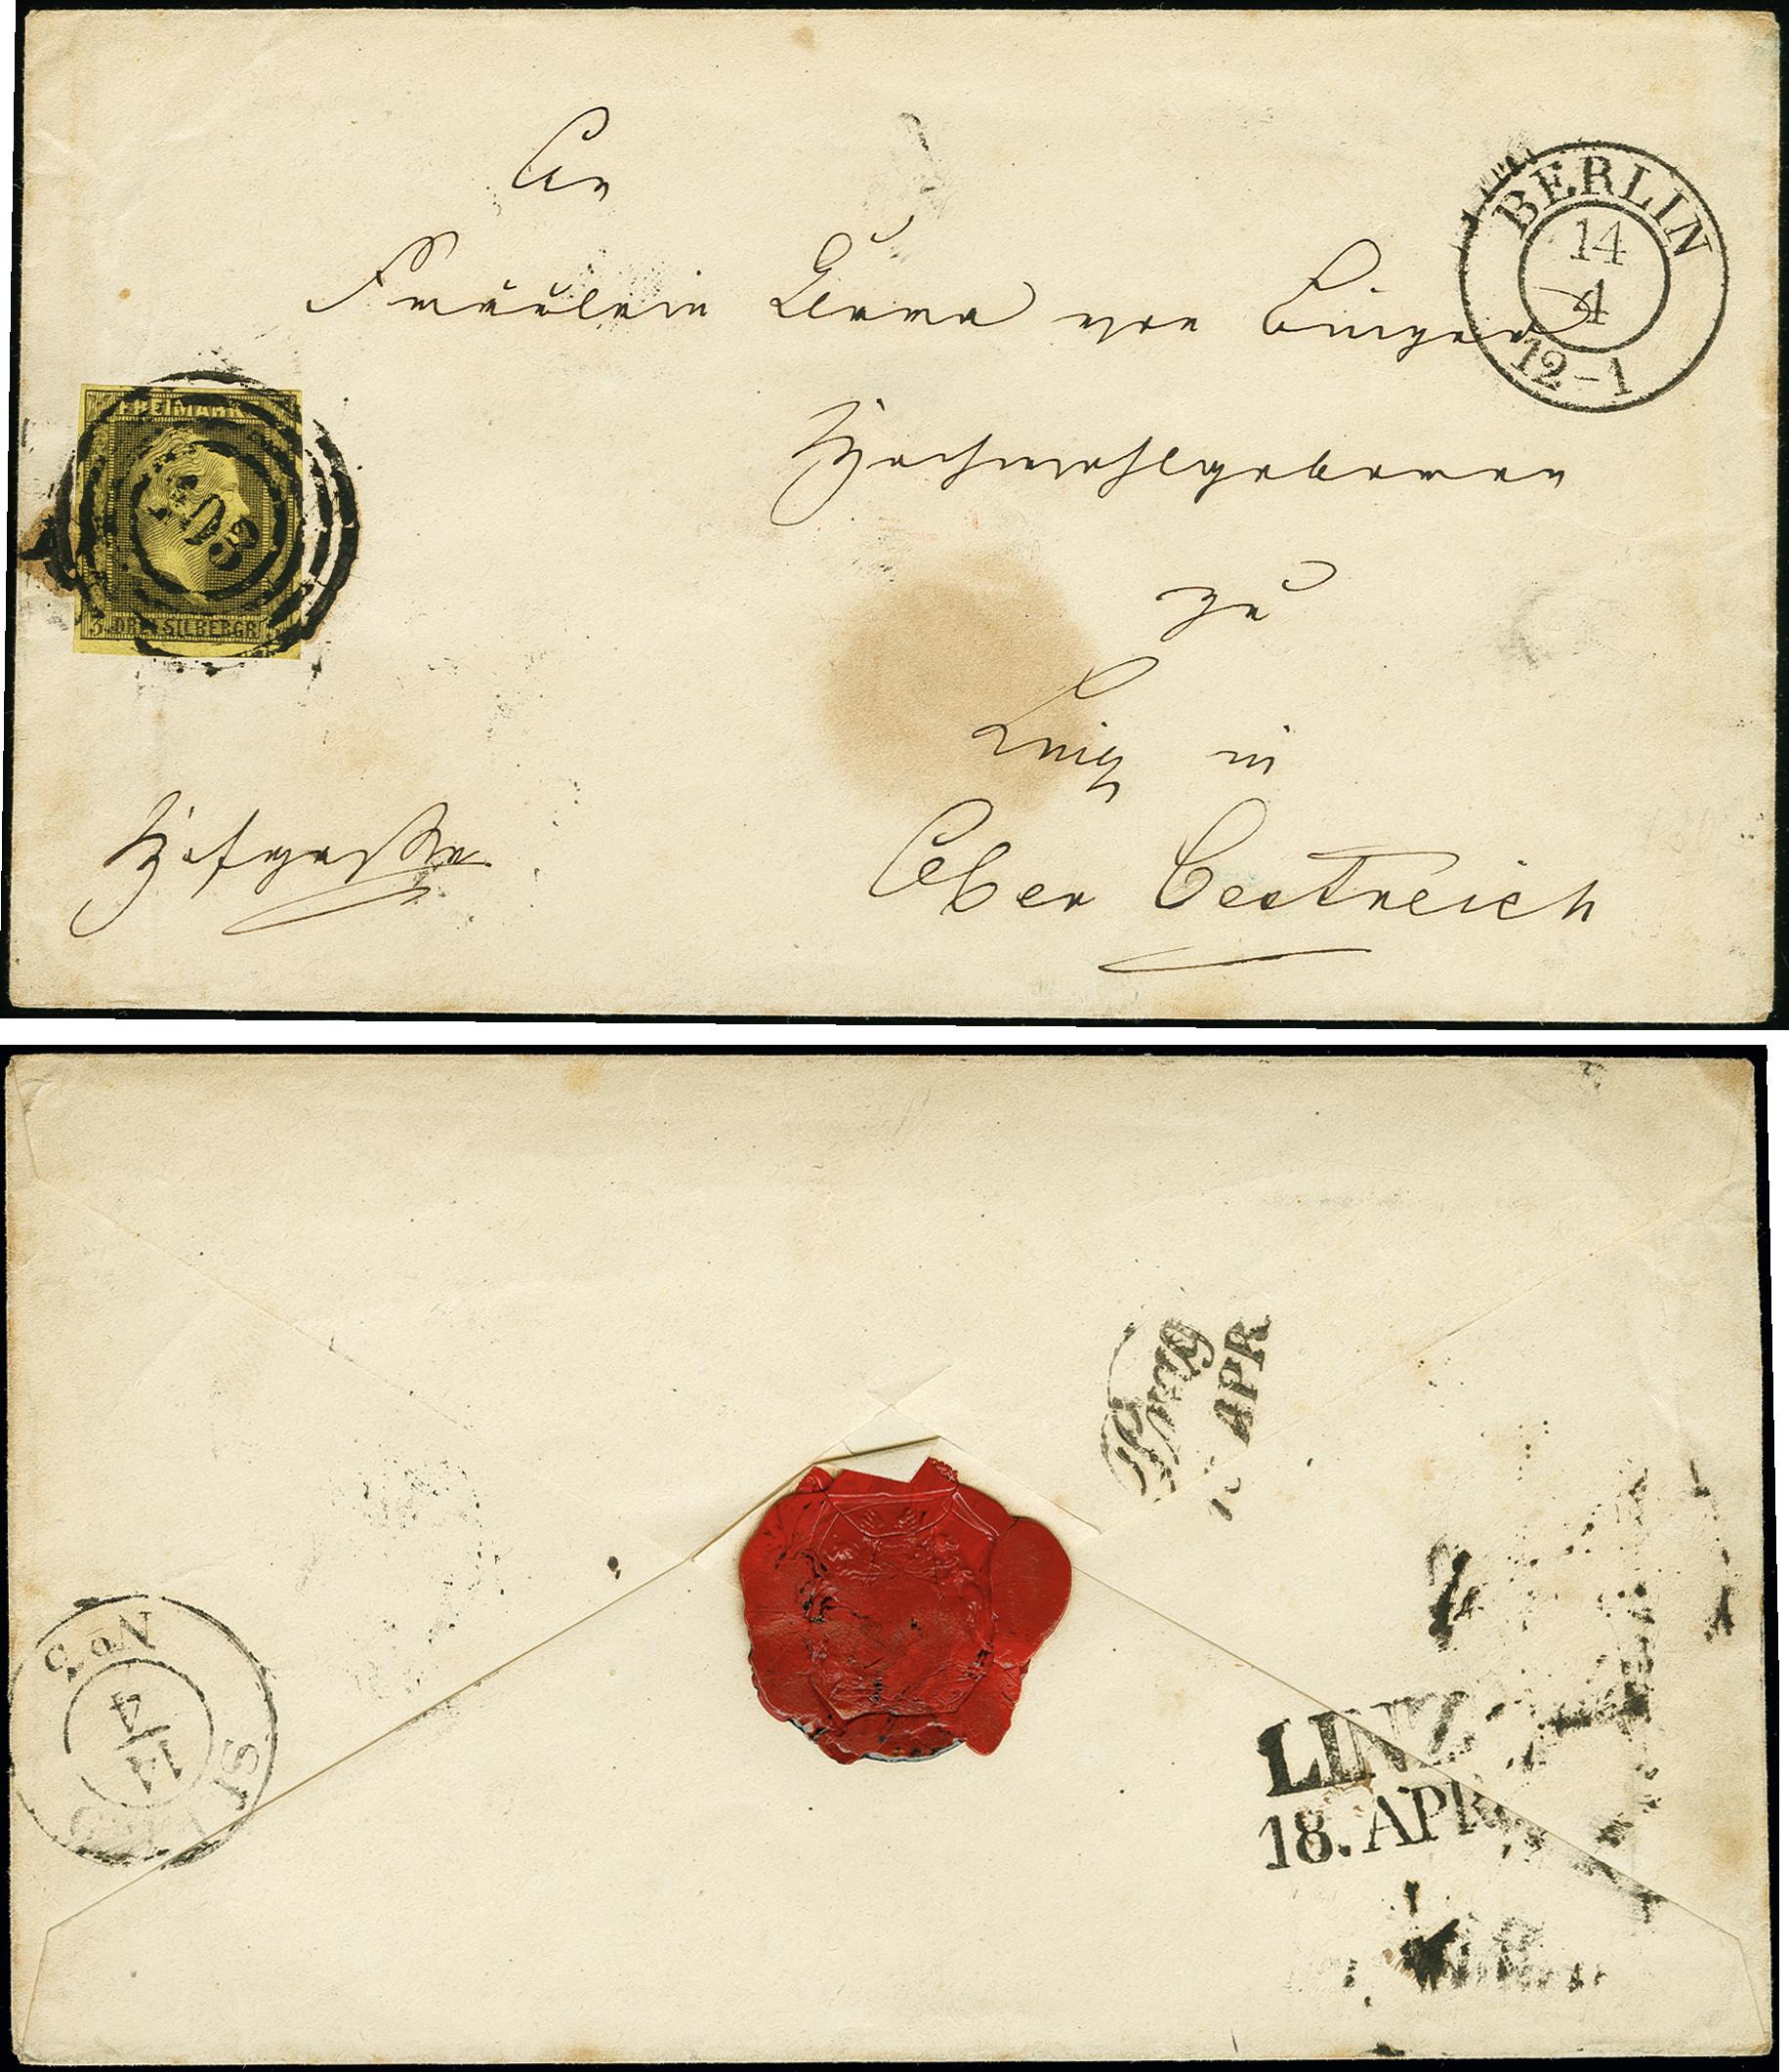 Lot 3450 - prussia prussia - cancellations -  Heinrich Koehler Auktionen Auction #368- Day 5